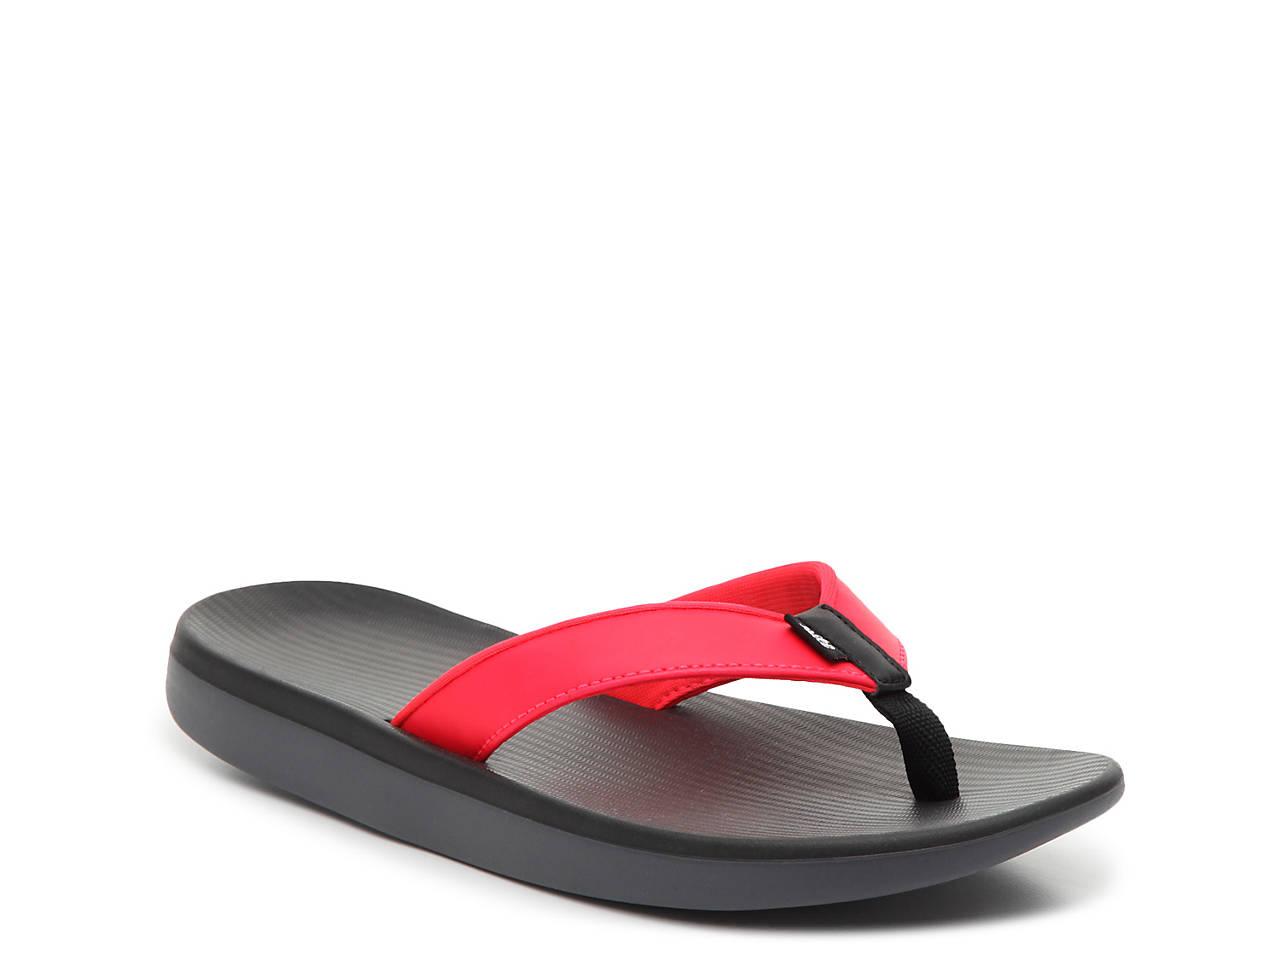 47eff6fb4359b8 Nike Bella Kai Flip Flop Women s Shoes